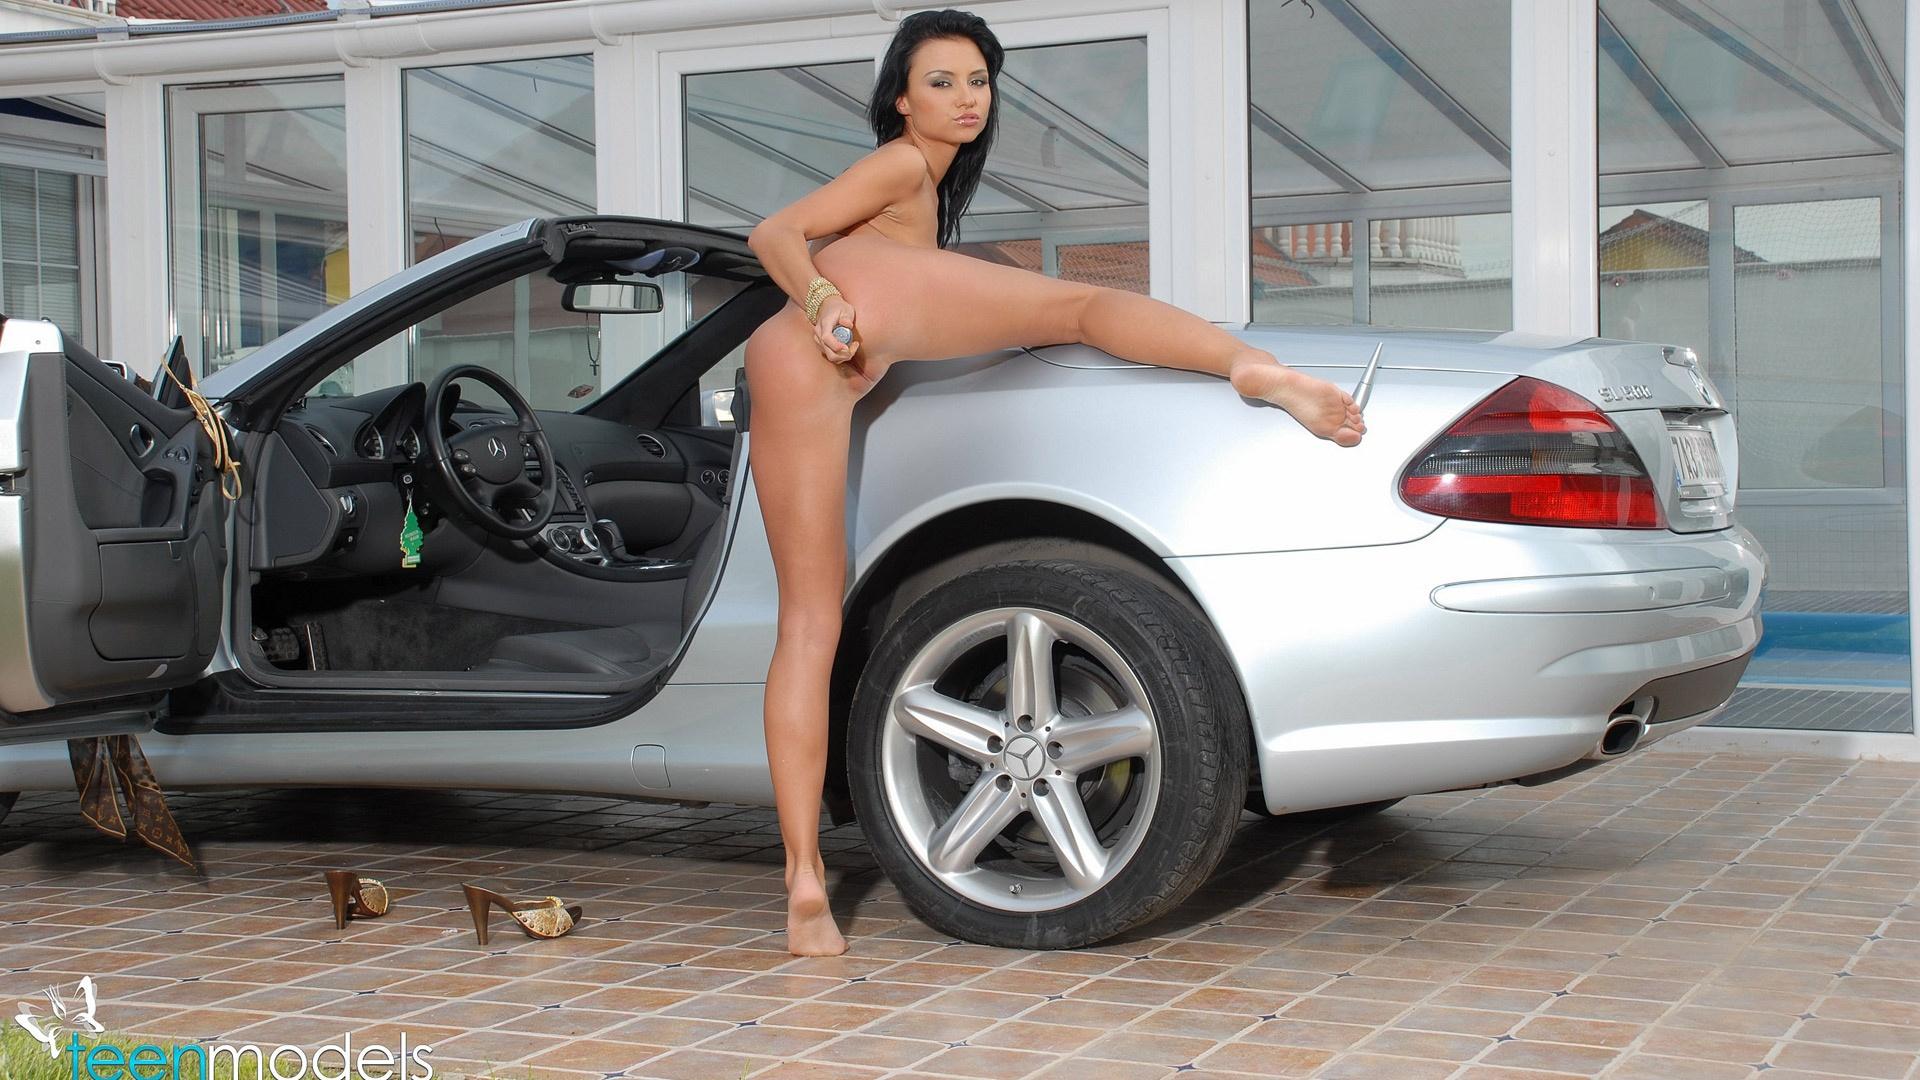 Geena davis naked sex